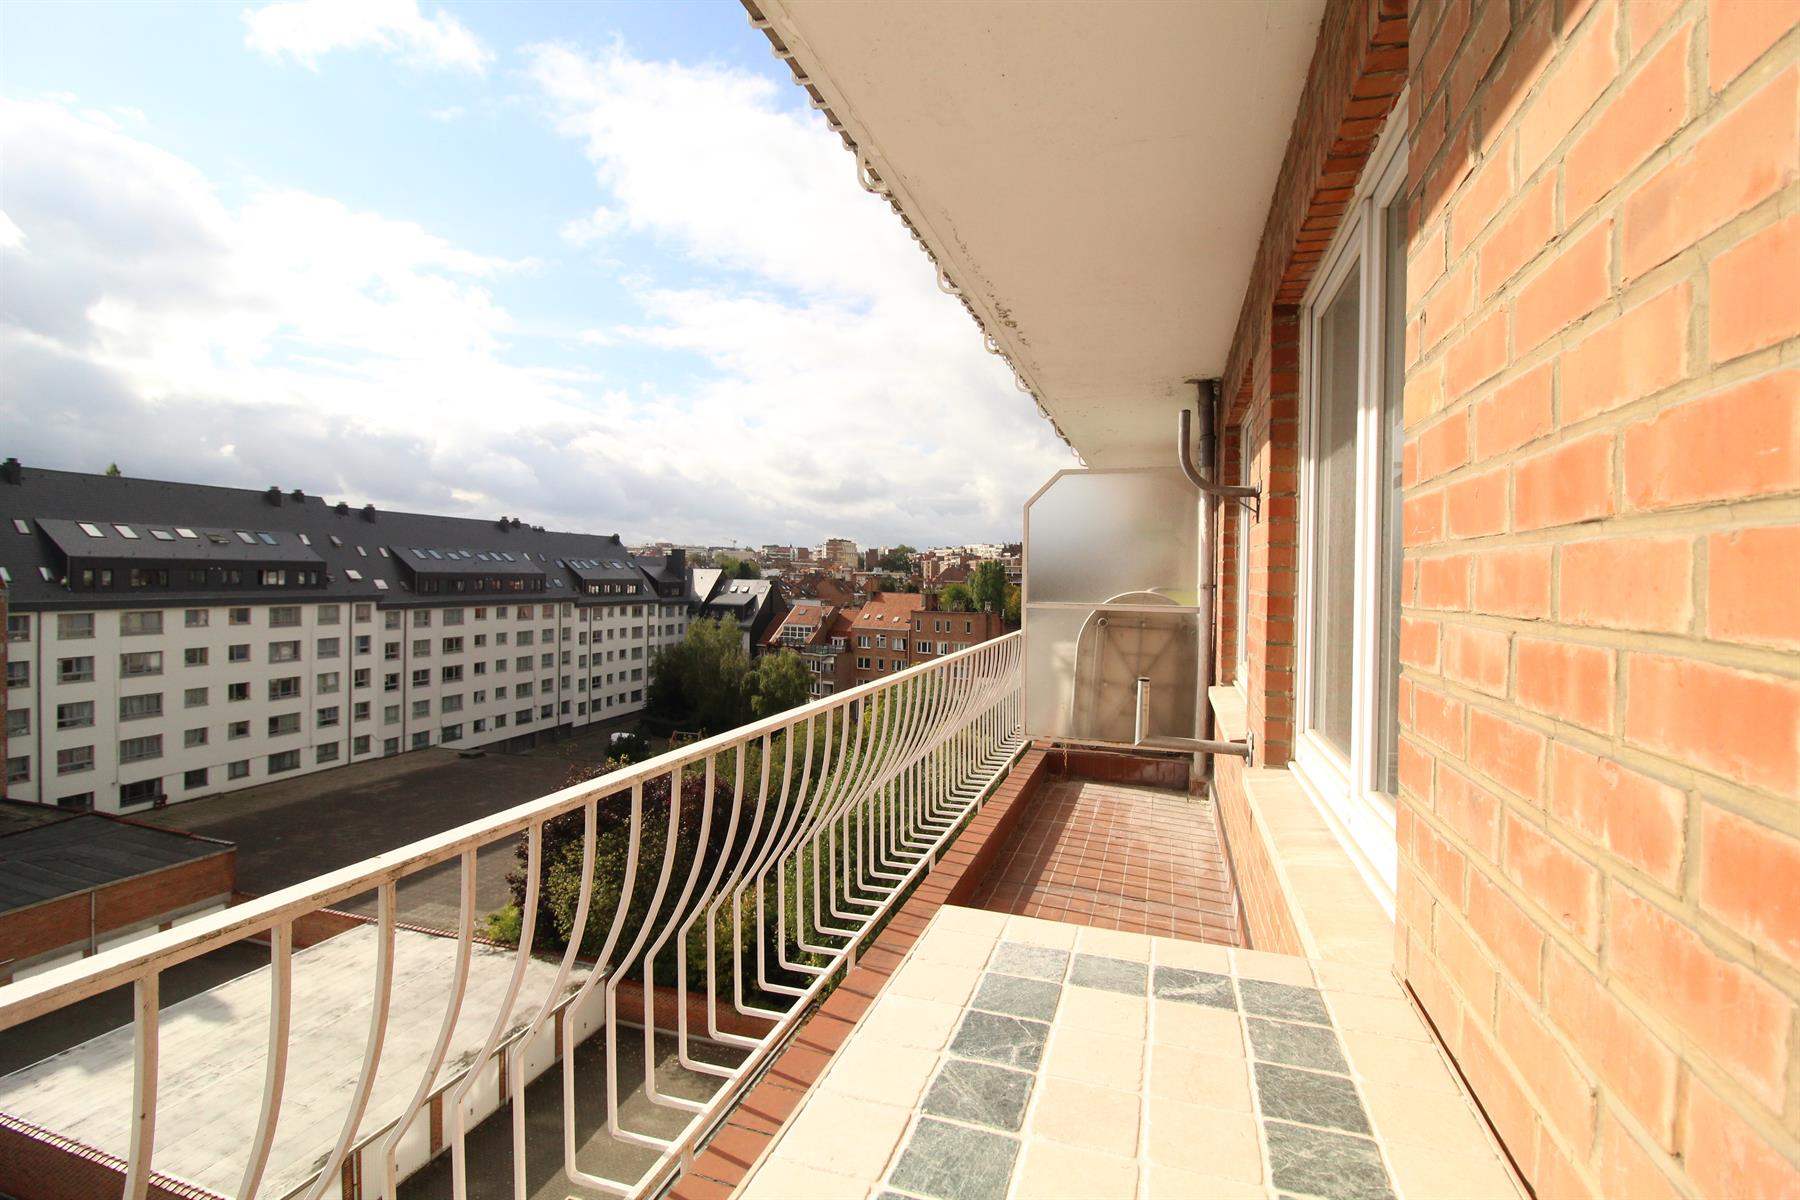 Appartement - Woluwe-Saint-Lambert - #4183448-6